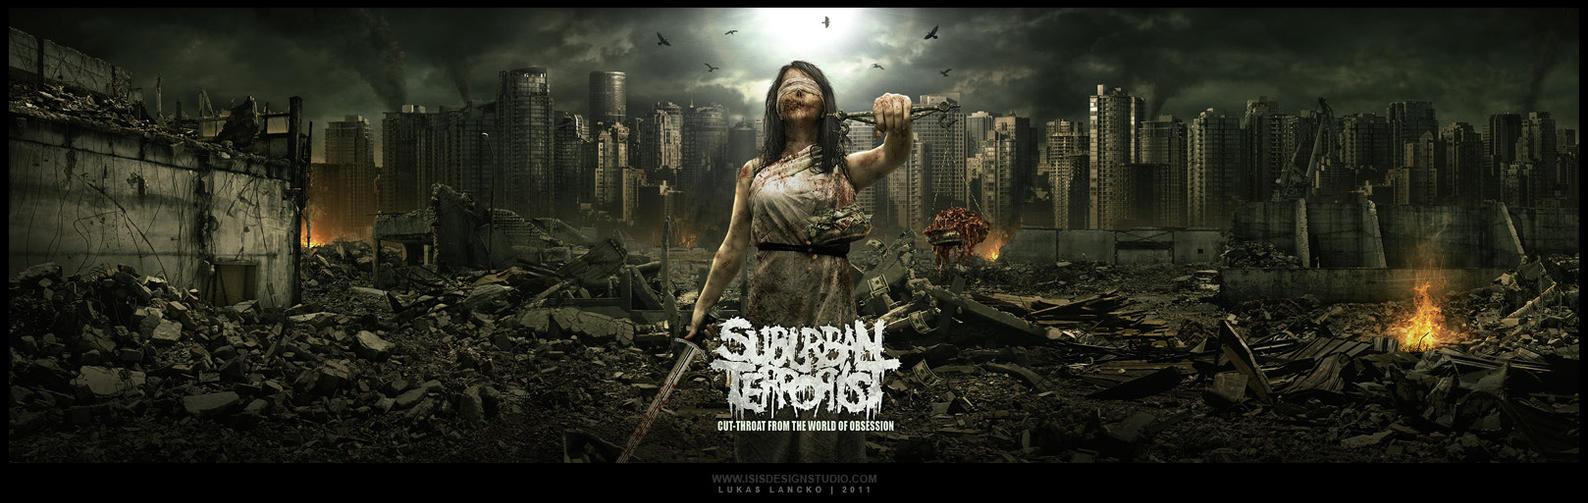 SUBURBAN TERRORIST mp by isisdesignstudio